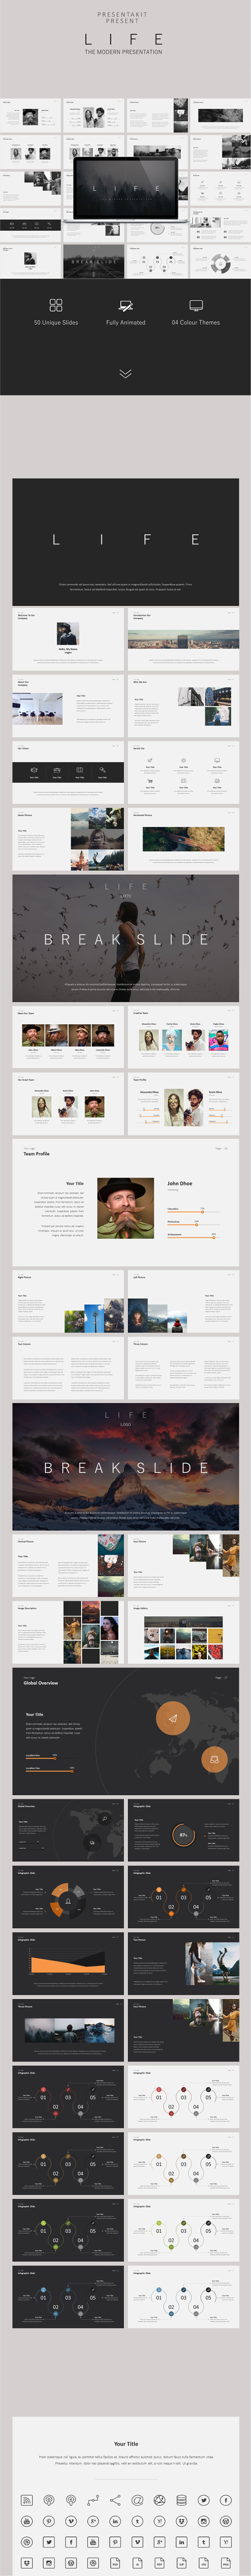 Life - Modern Presentation Template - Business PowerPoint Templates